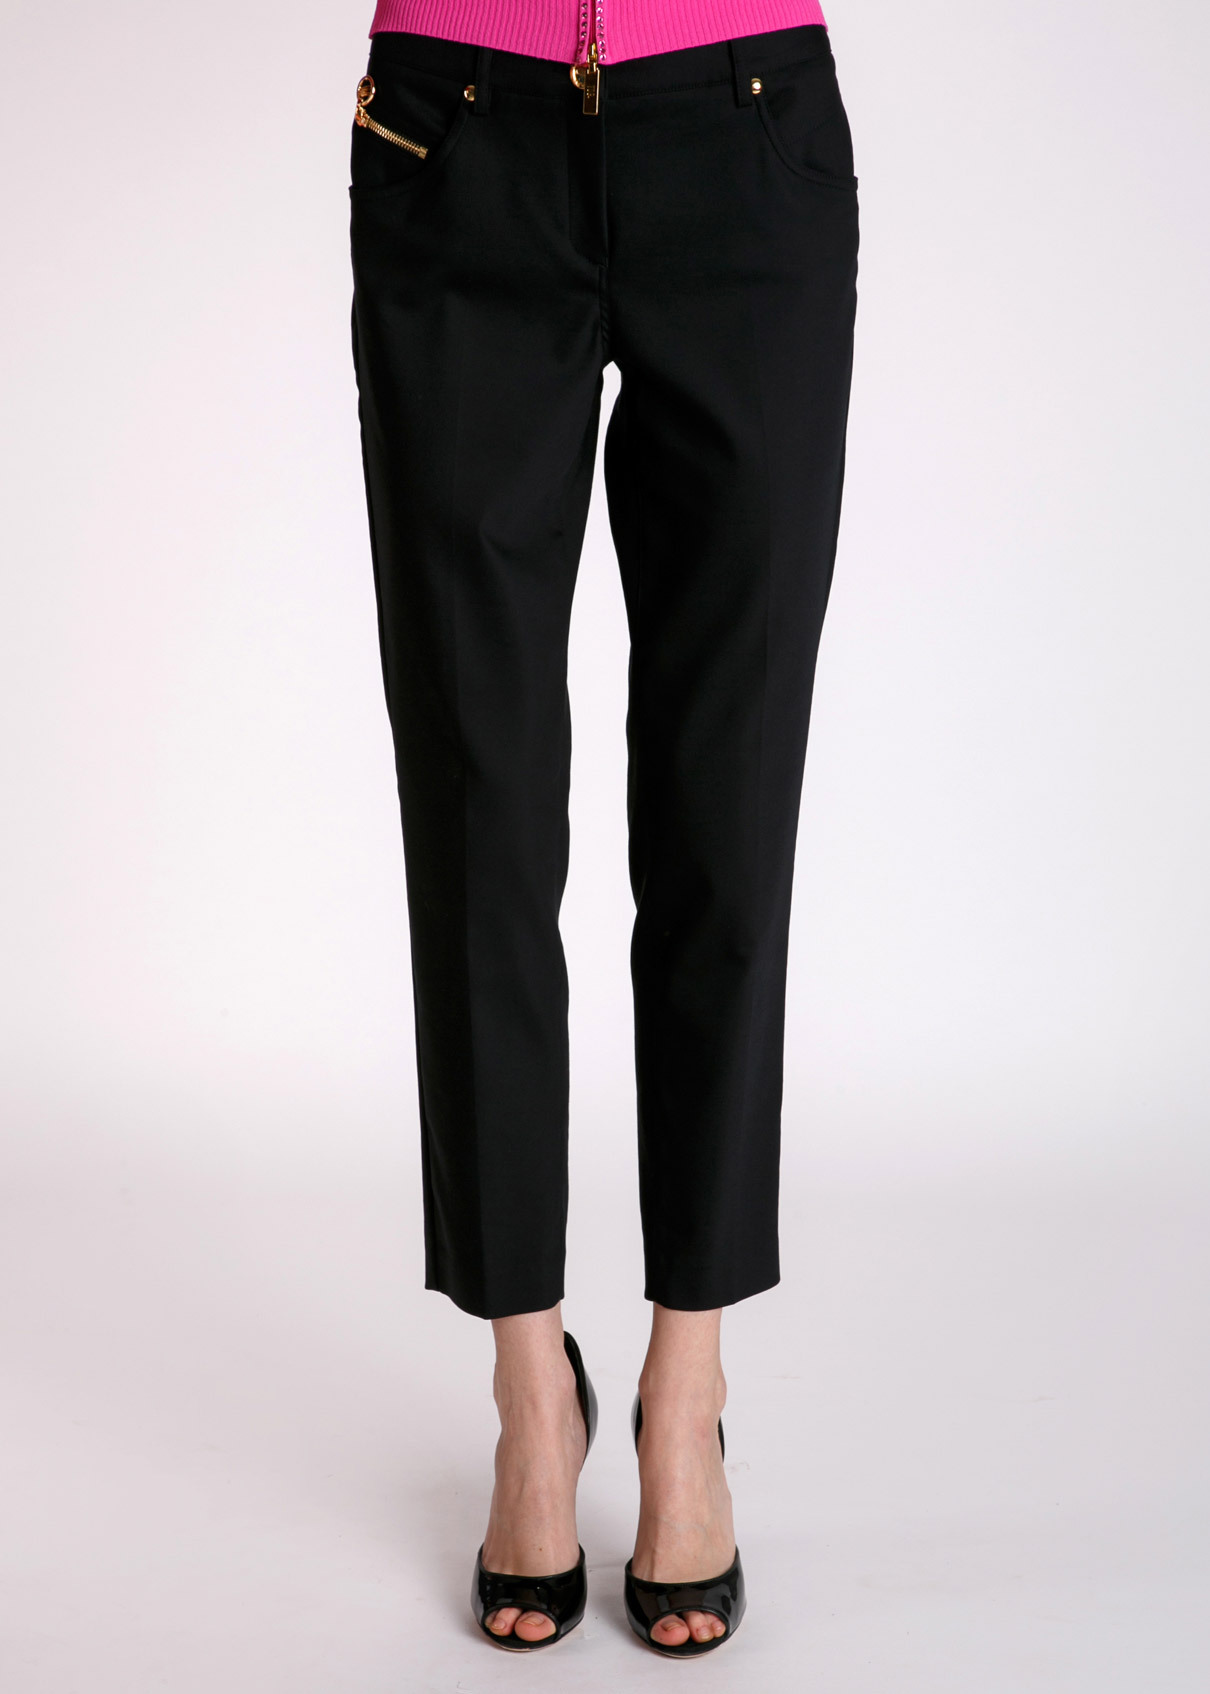 Коллекция брюк доставка